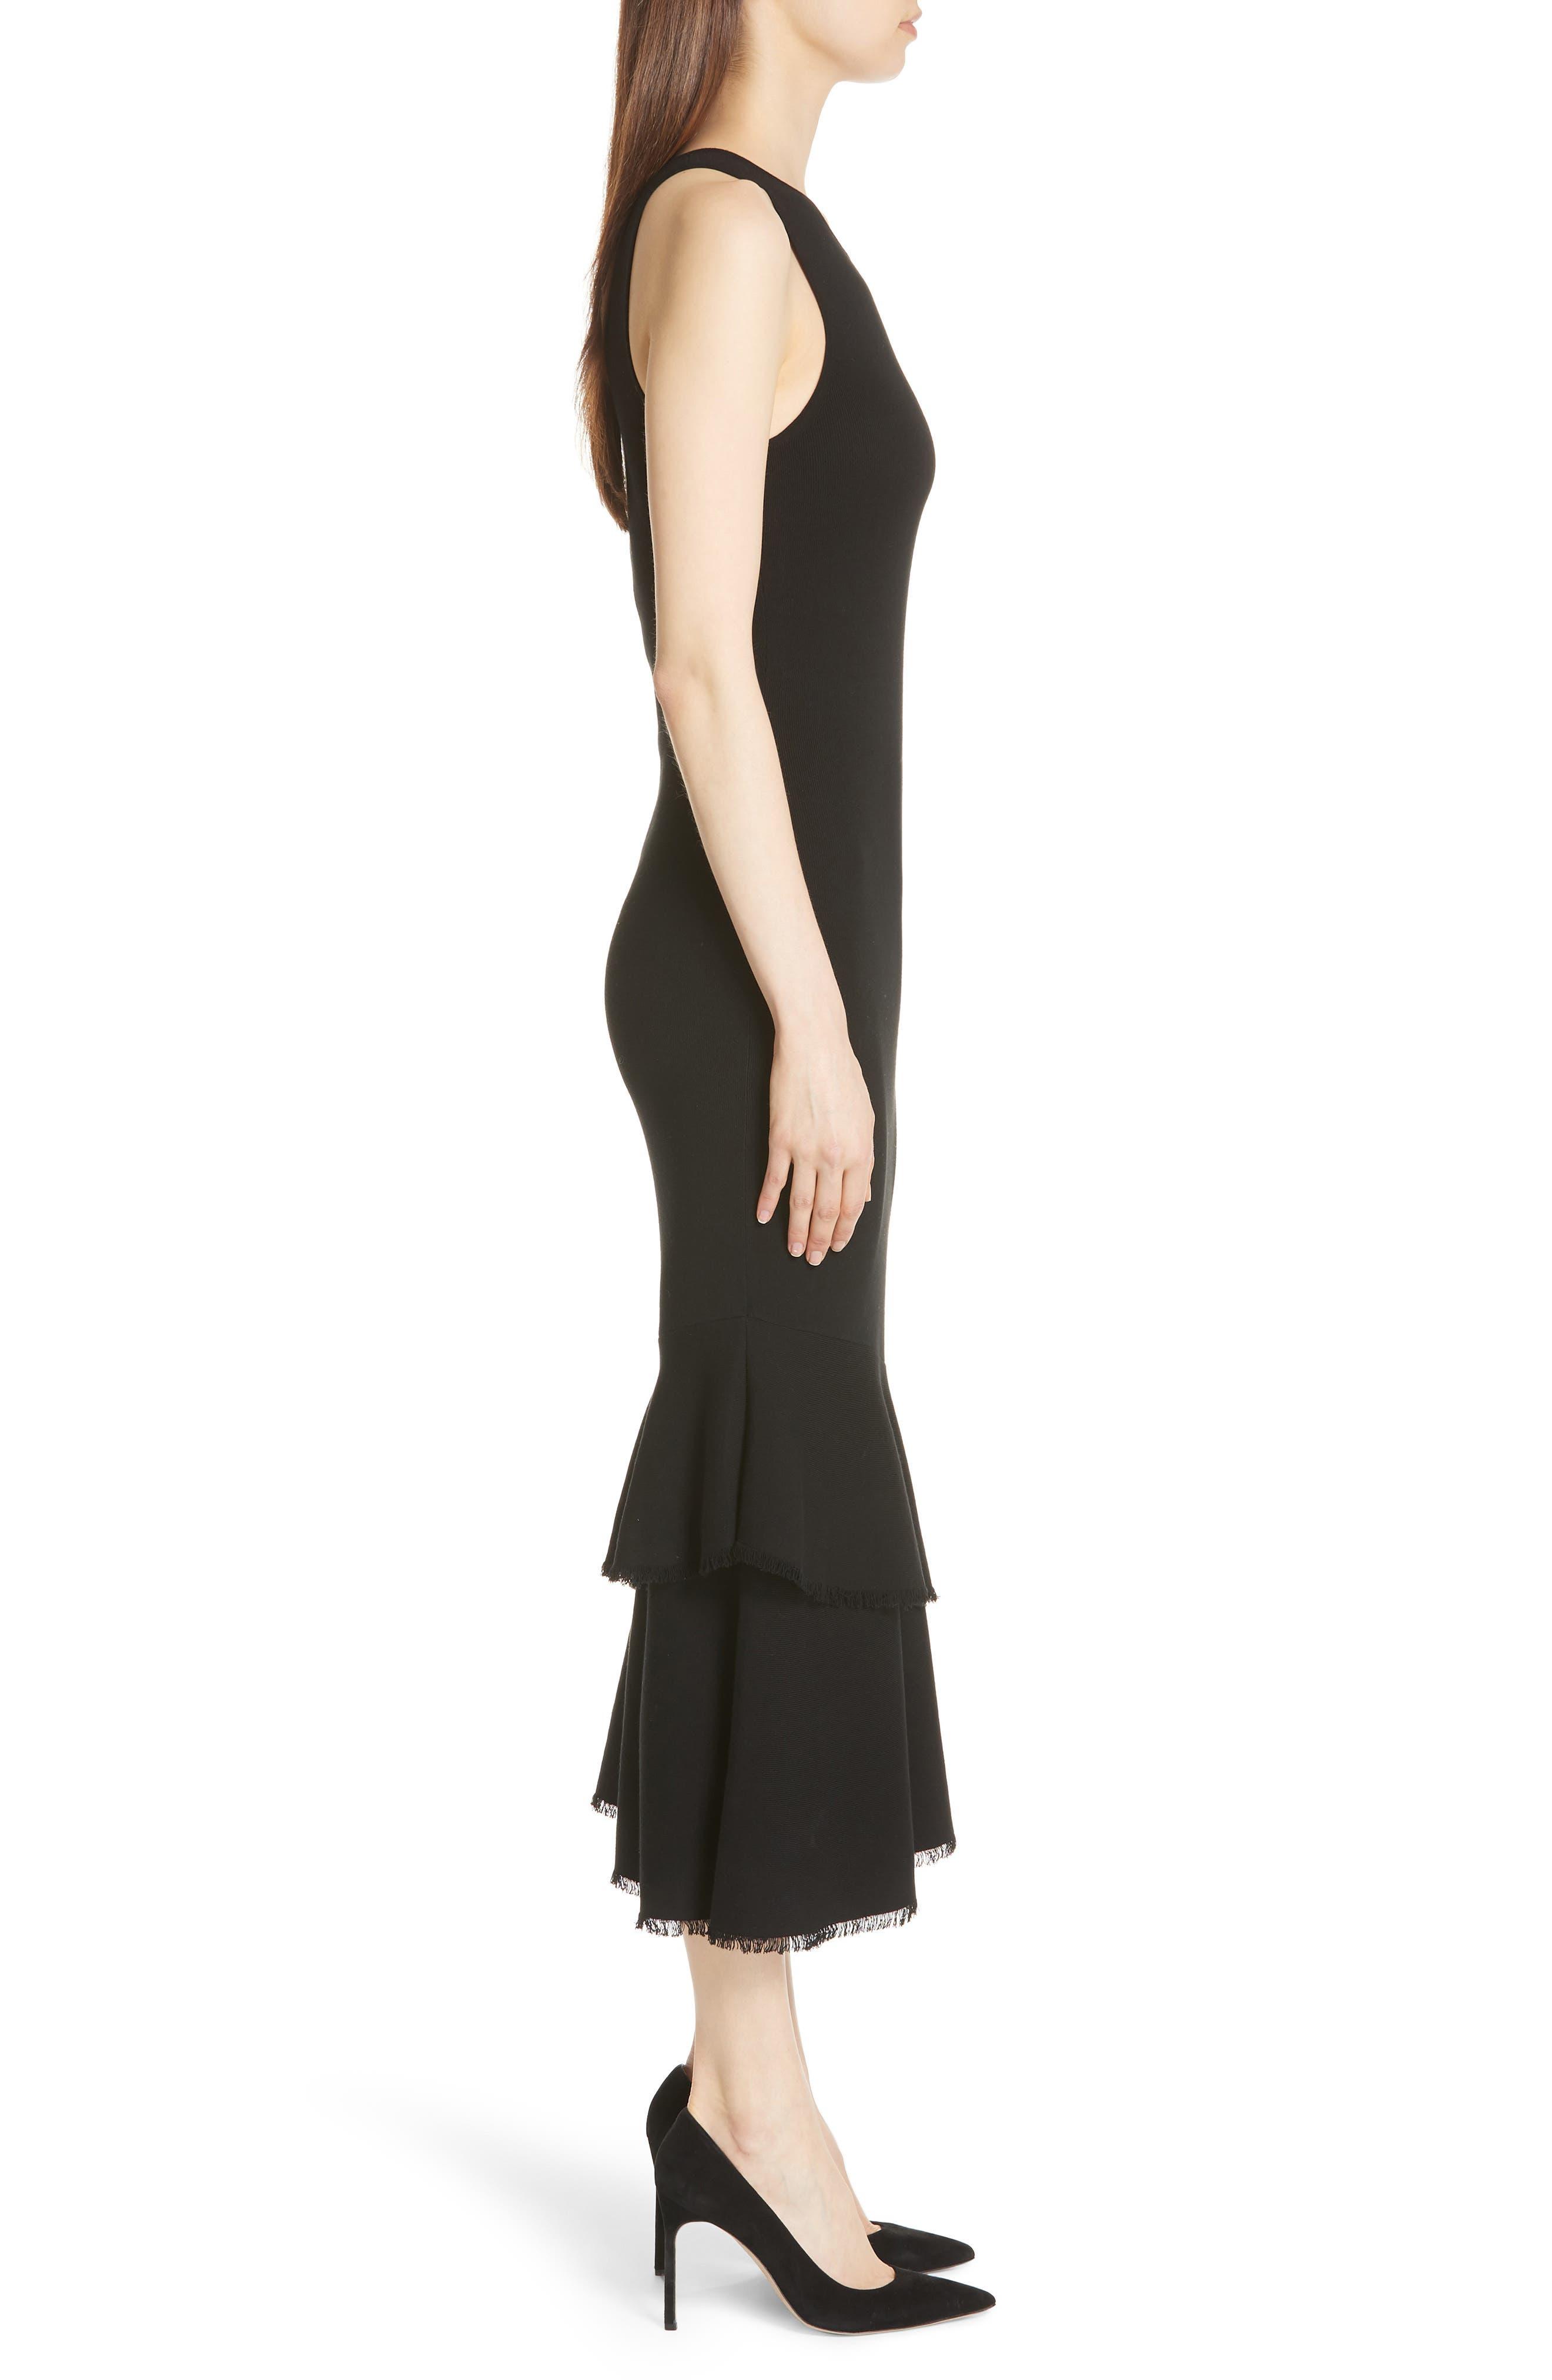 Nilimary Prosecco Midi Dress,                             Alternate thumbnail 3, color,                             Black